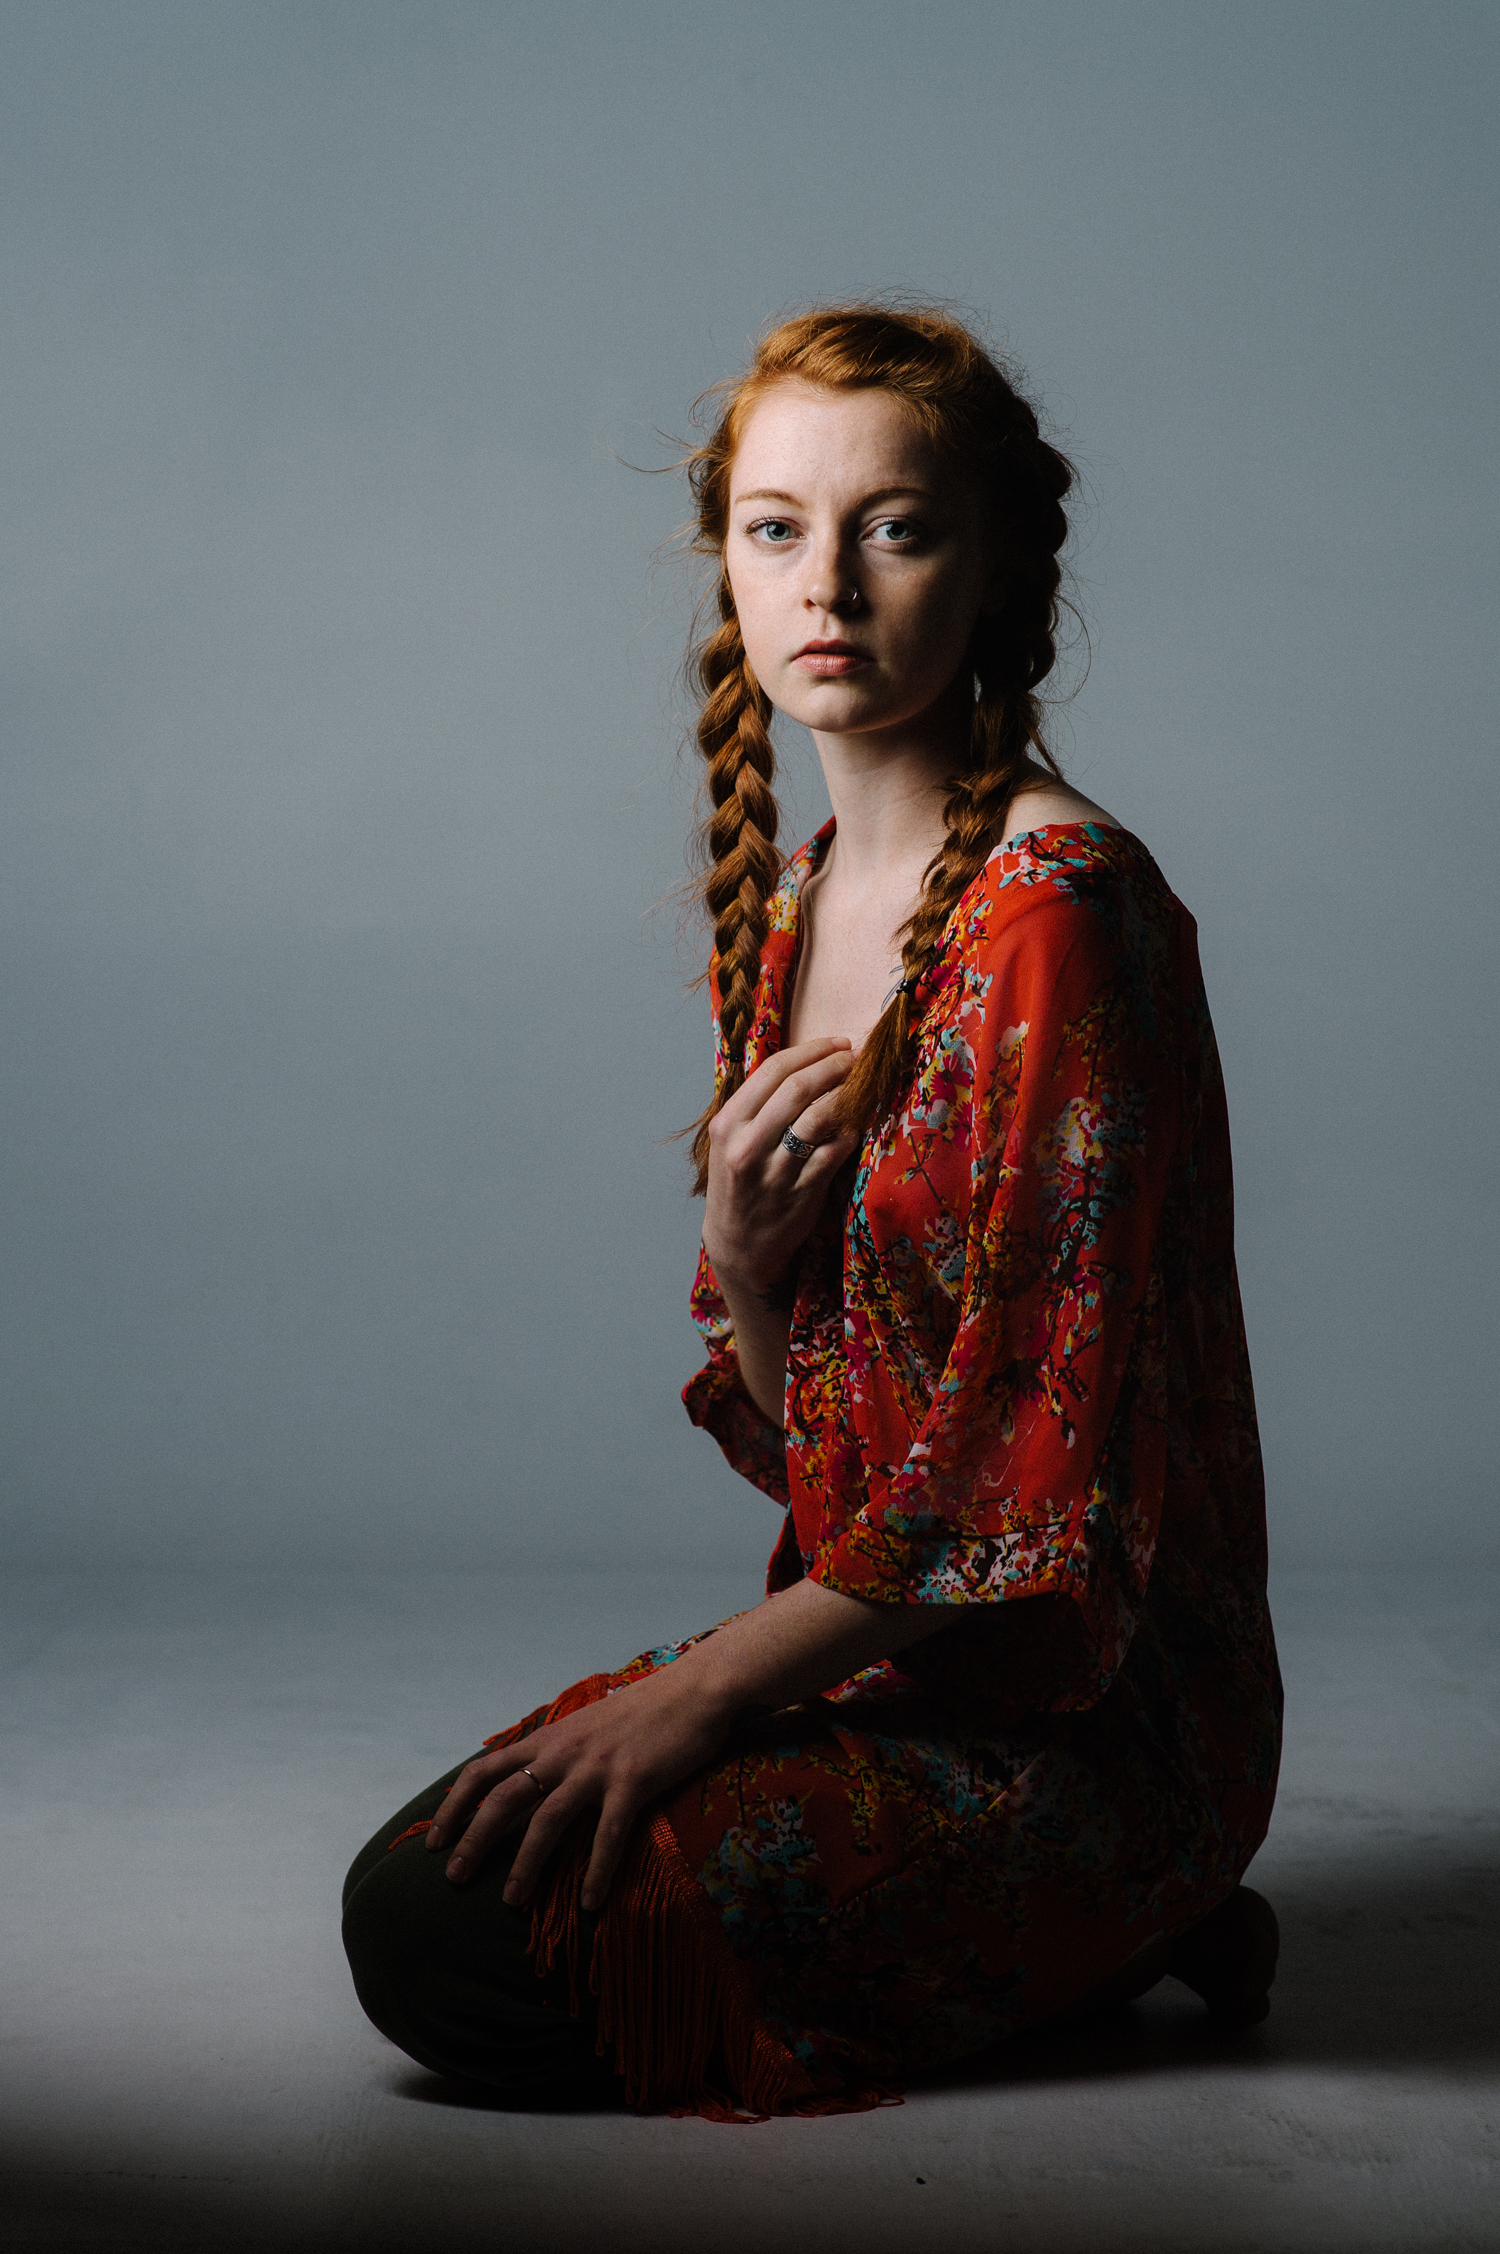 cady-studio-portraits-7677.jpg